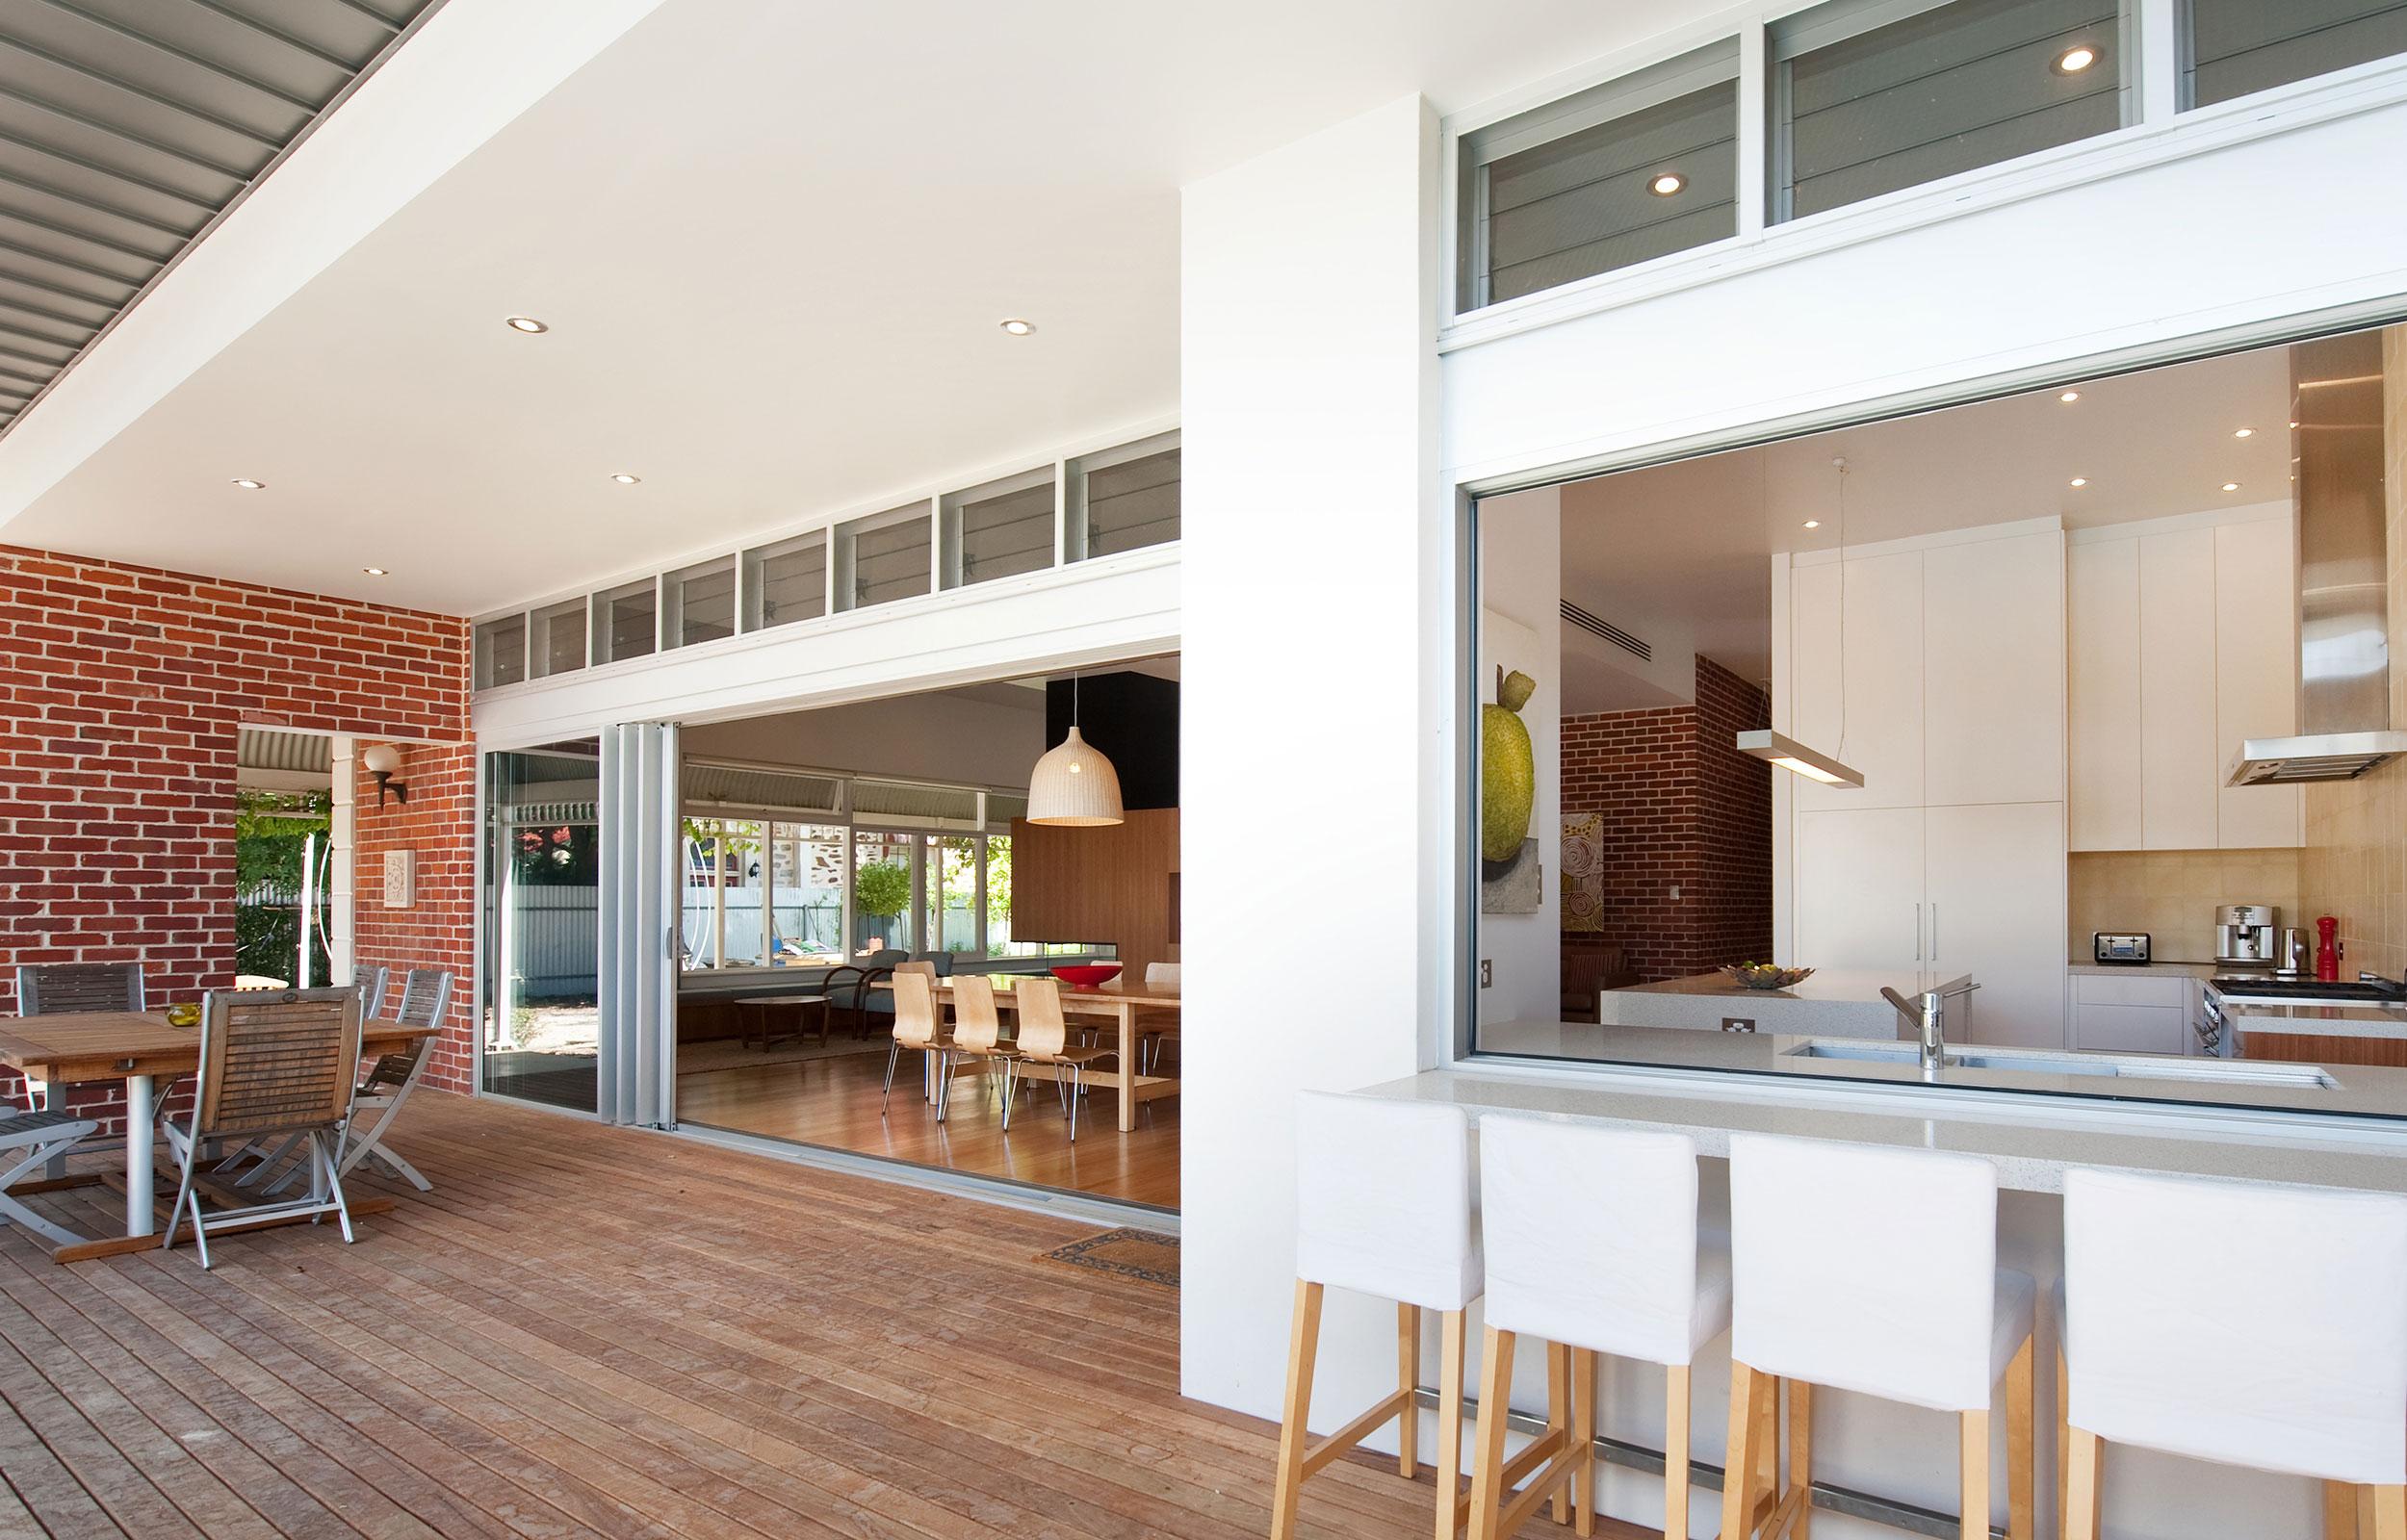 enoki-interior-Halbert-2.jpg